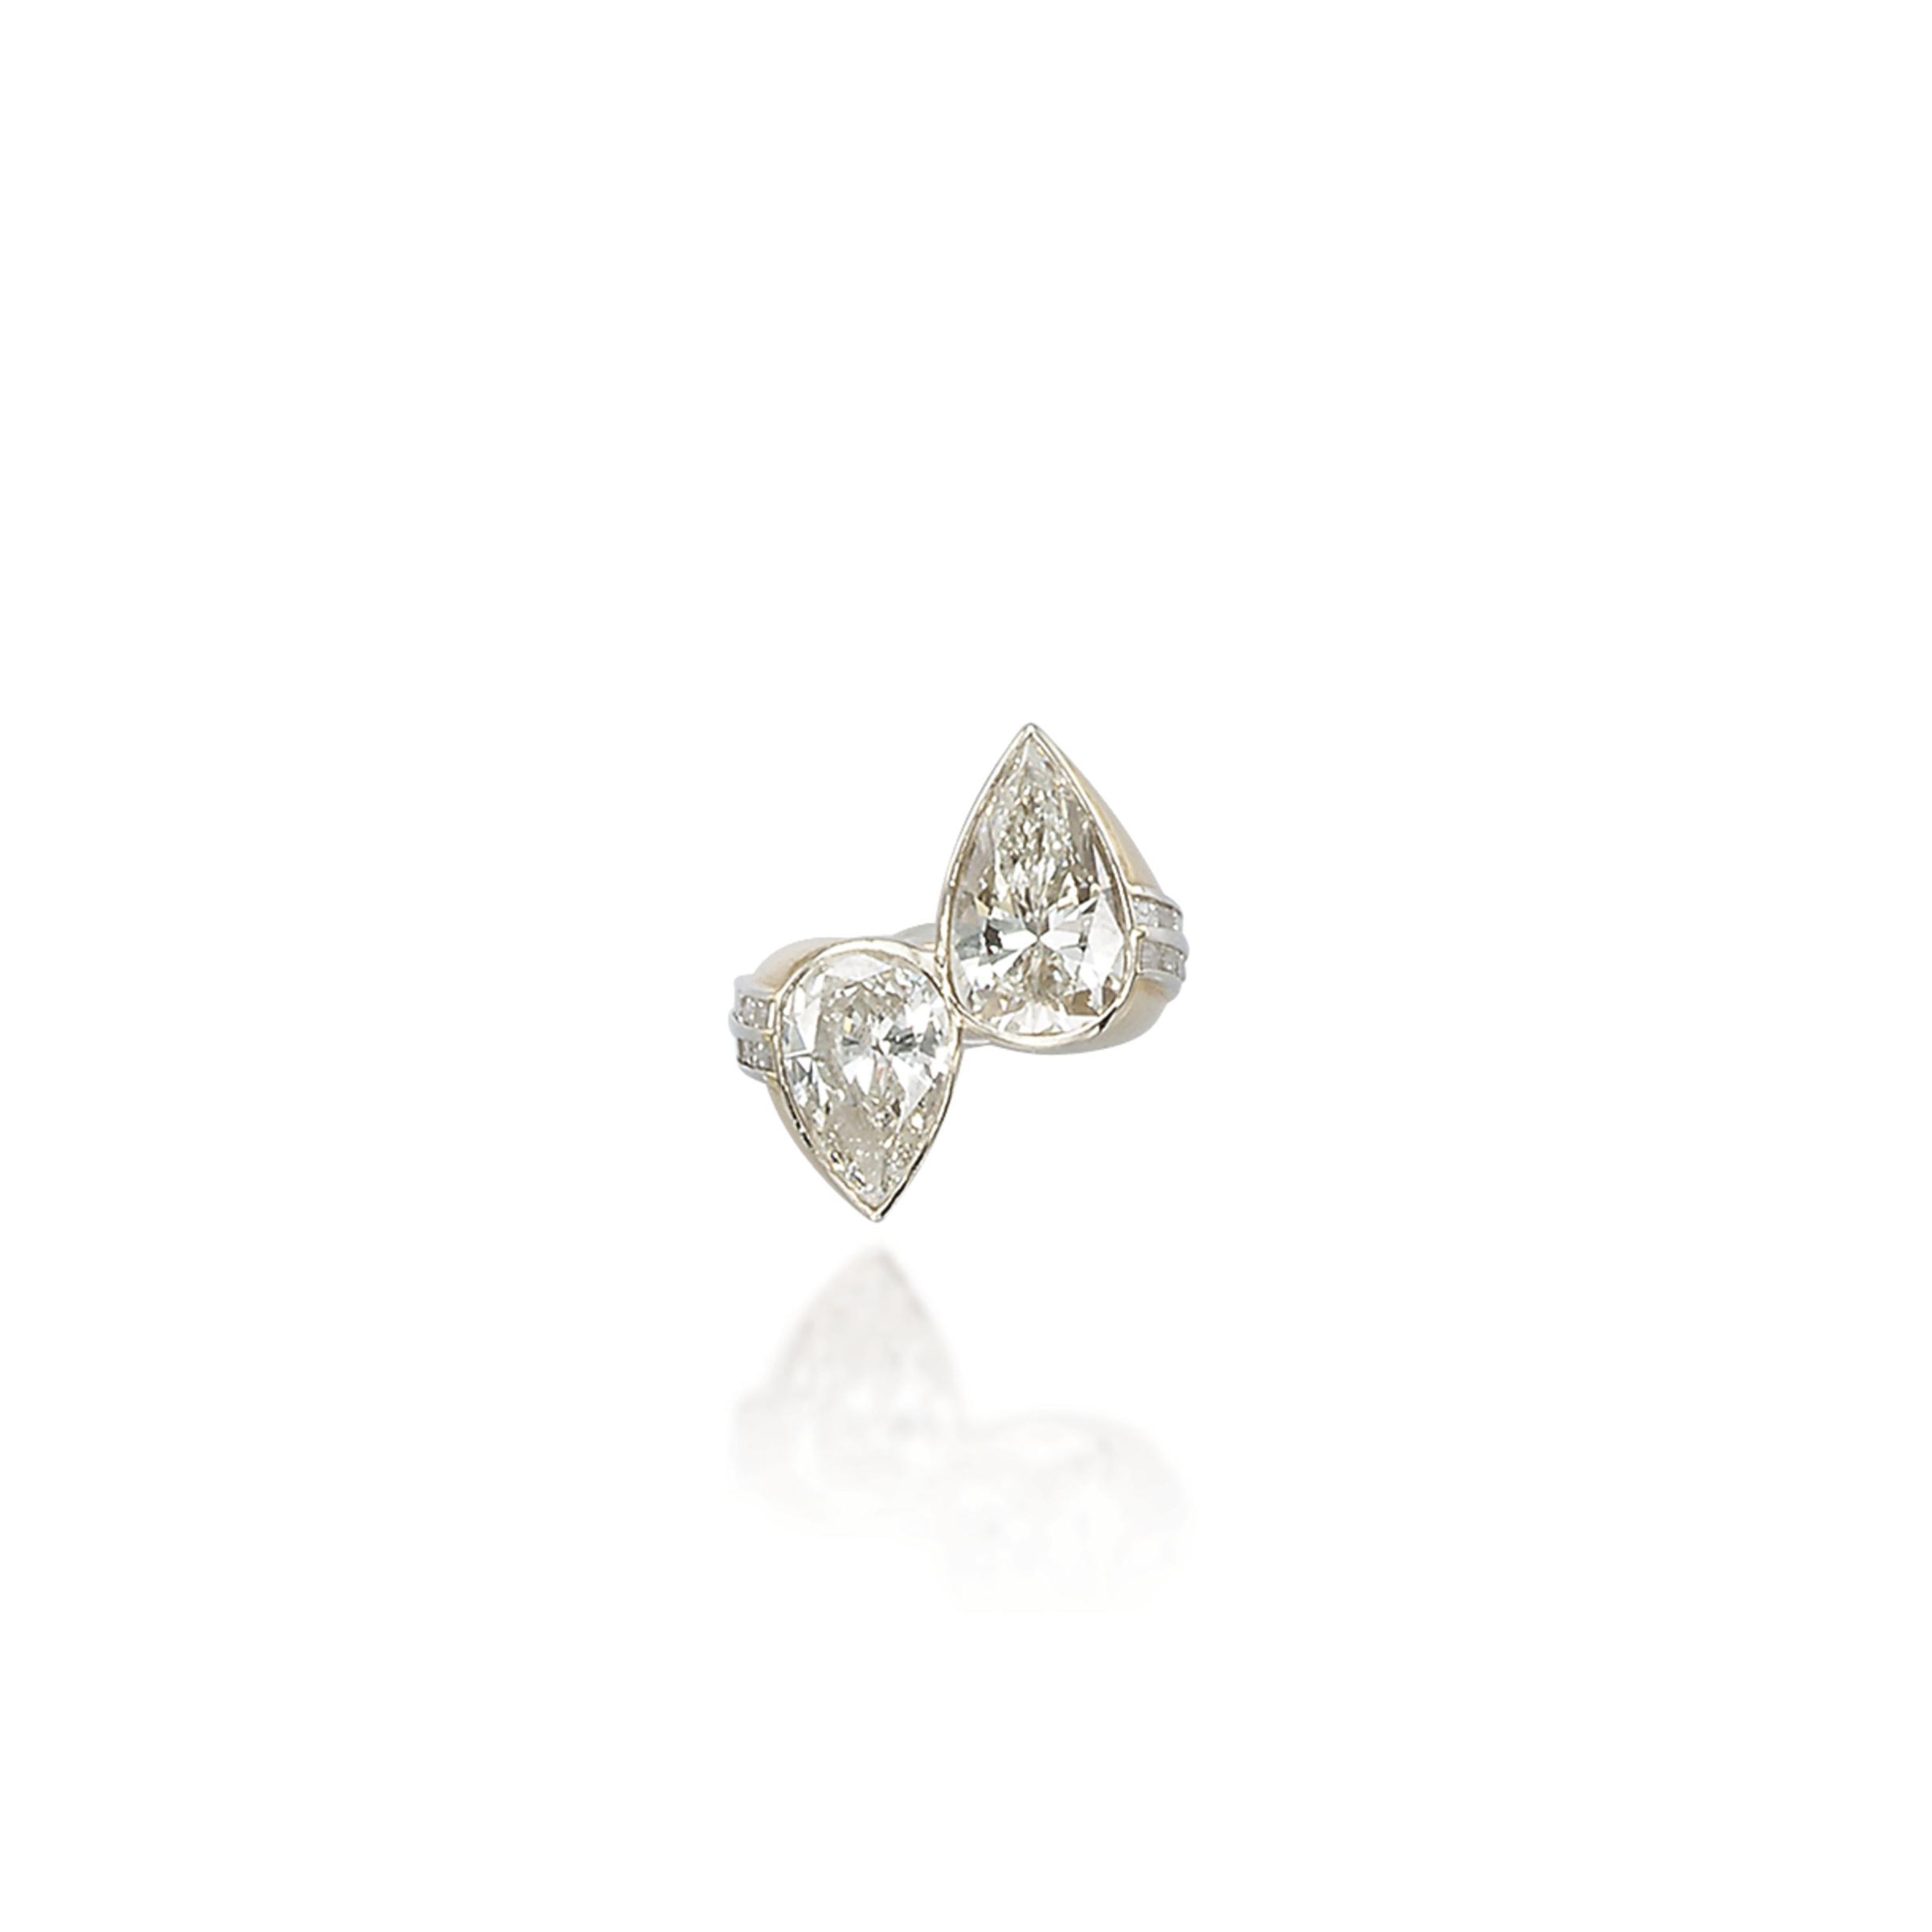 A 'TOI ET MOI' DIAMOND RING, BY REPOSSI